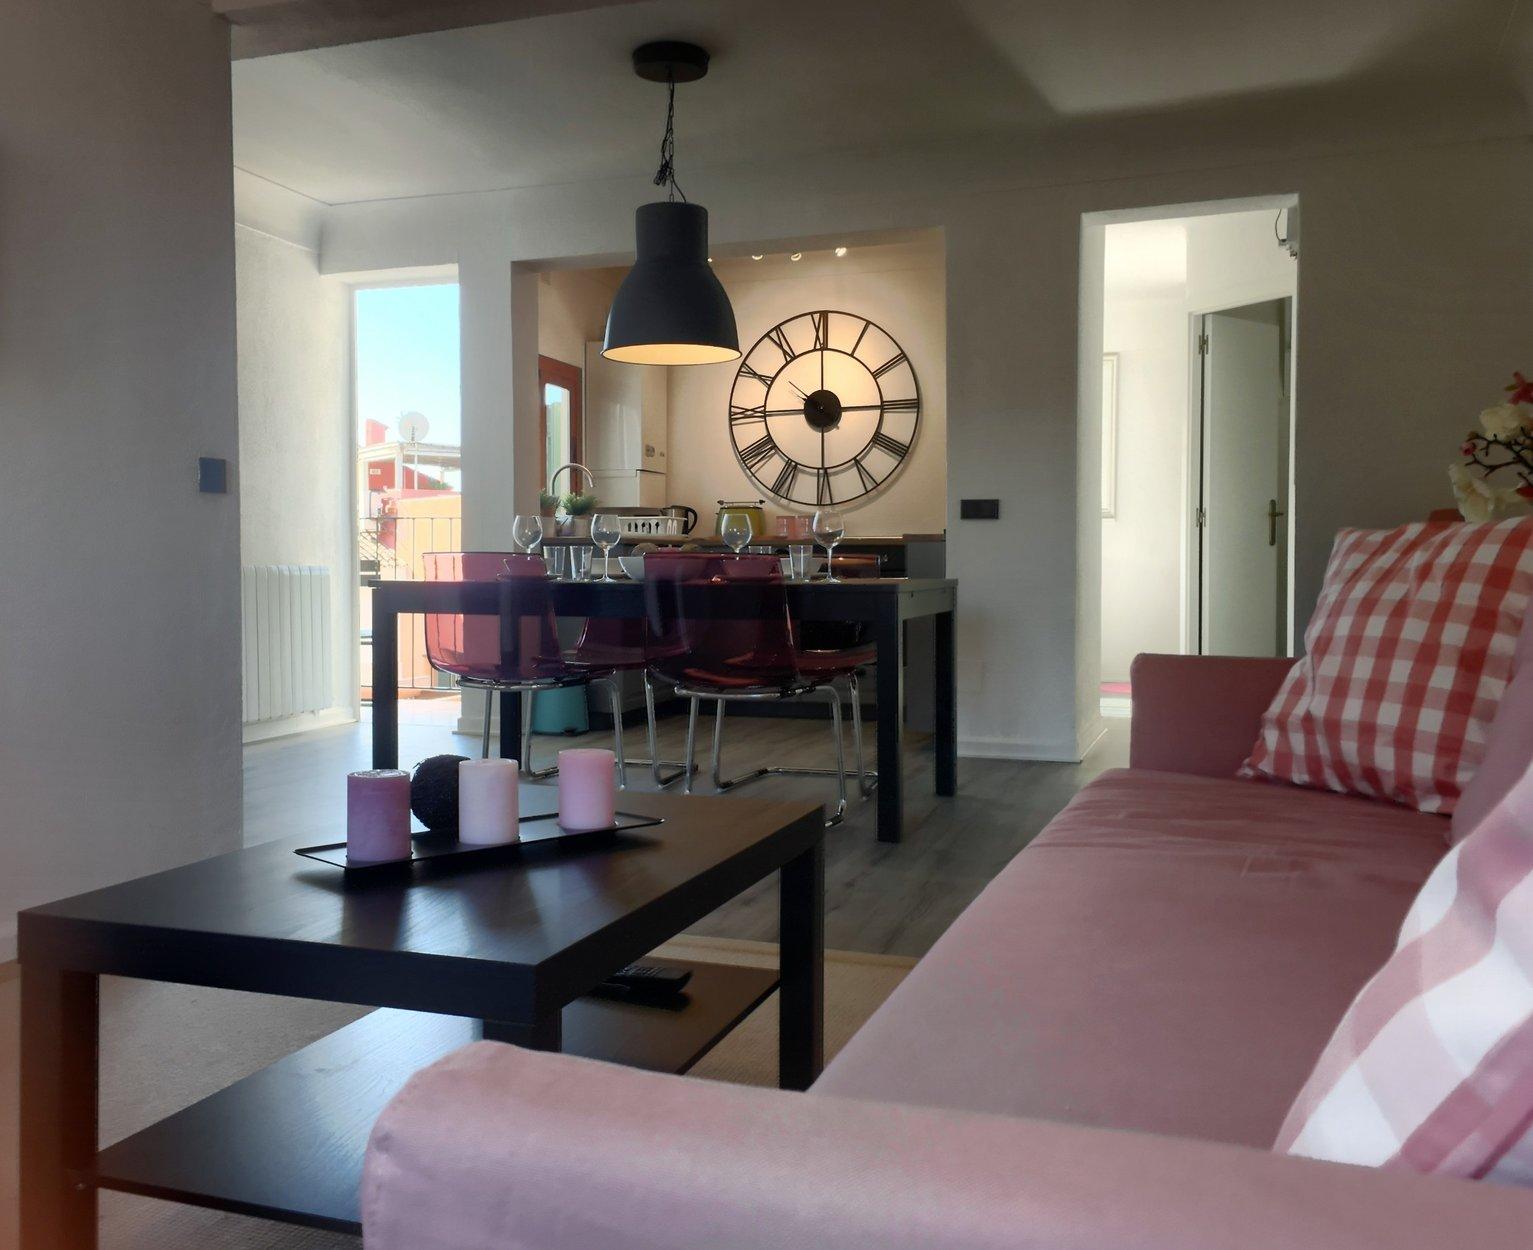 Apartment for rent in Palma de Mallorca - Mallorca